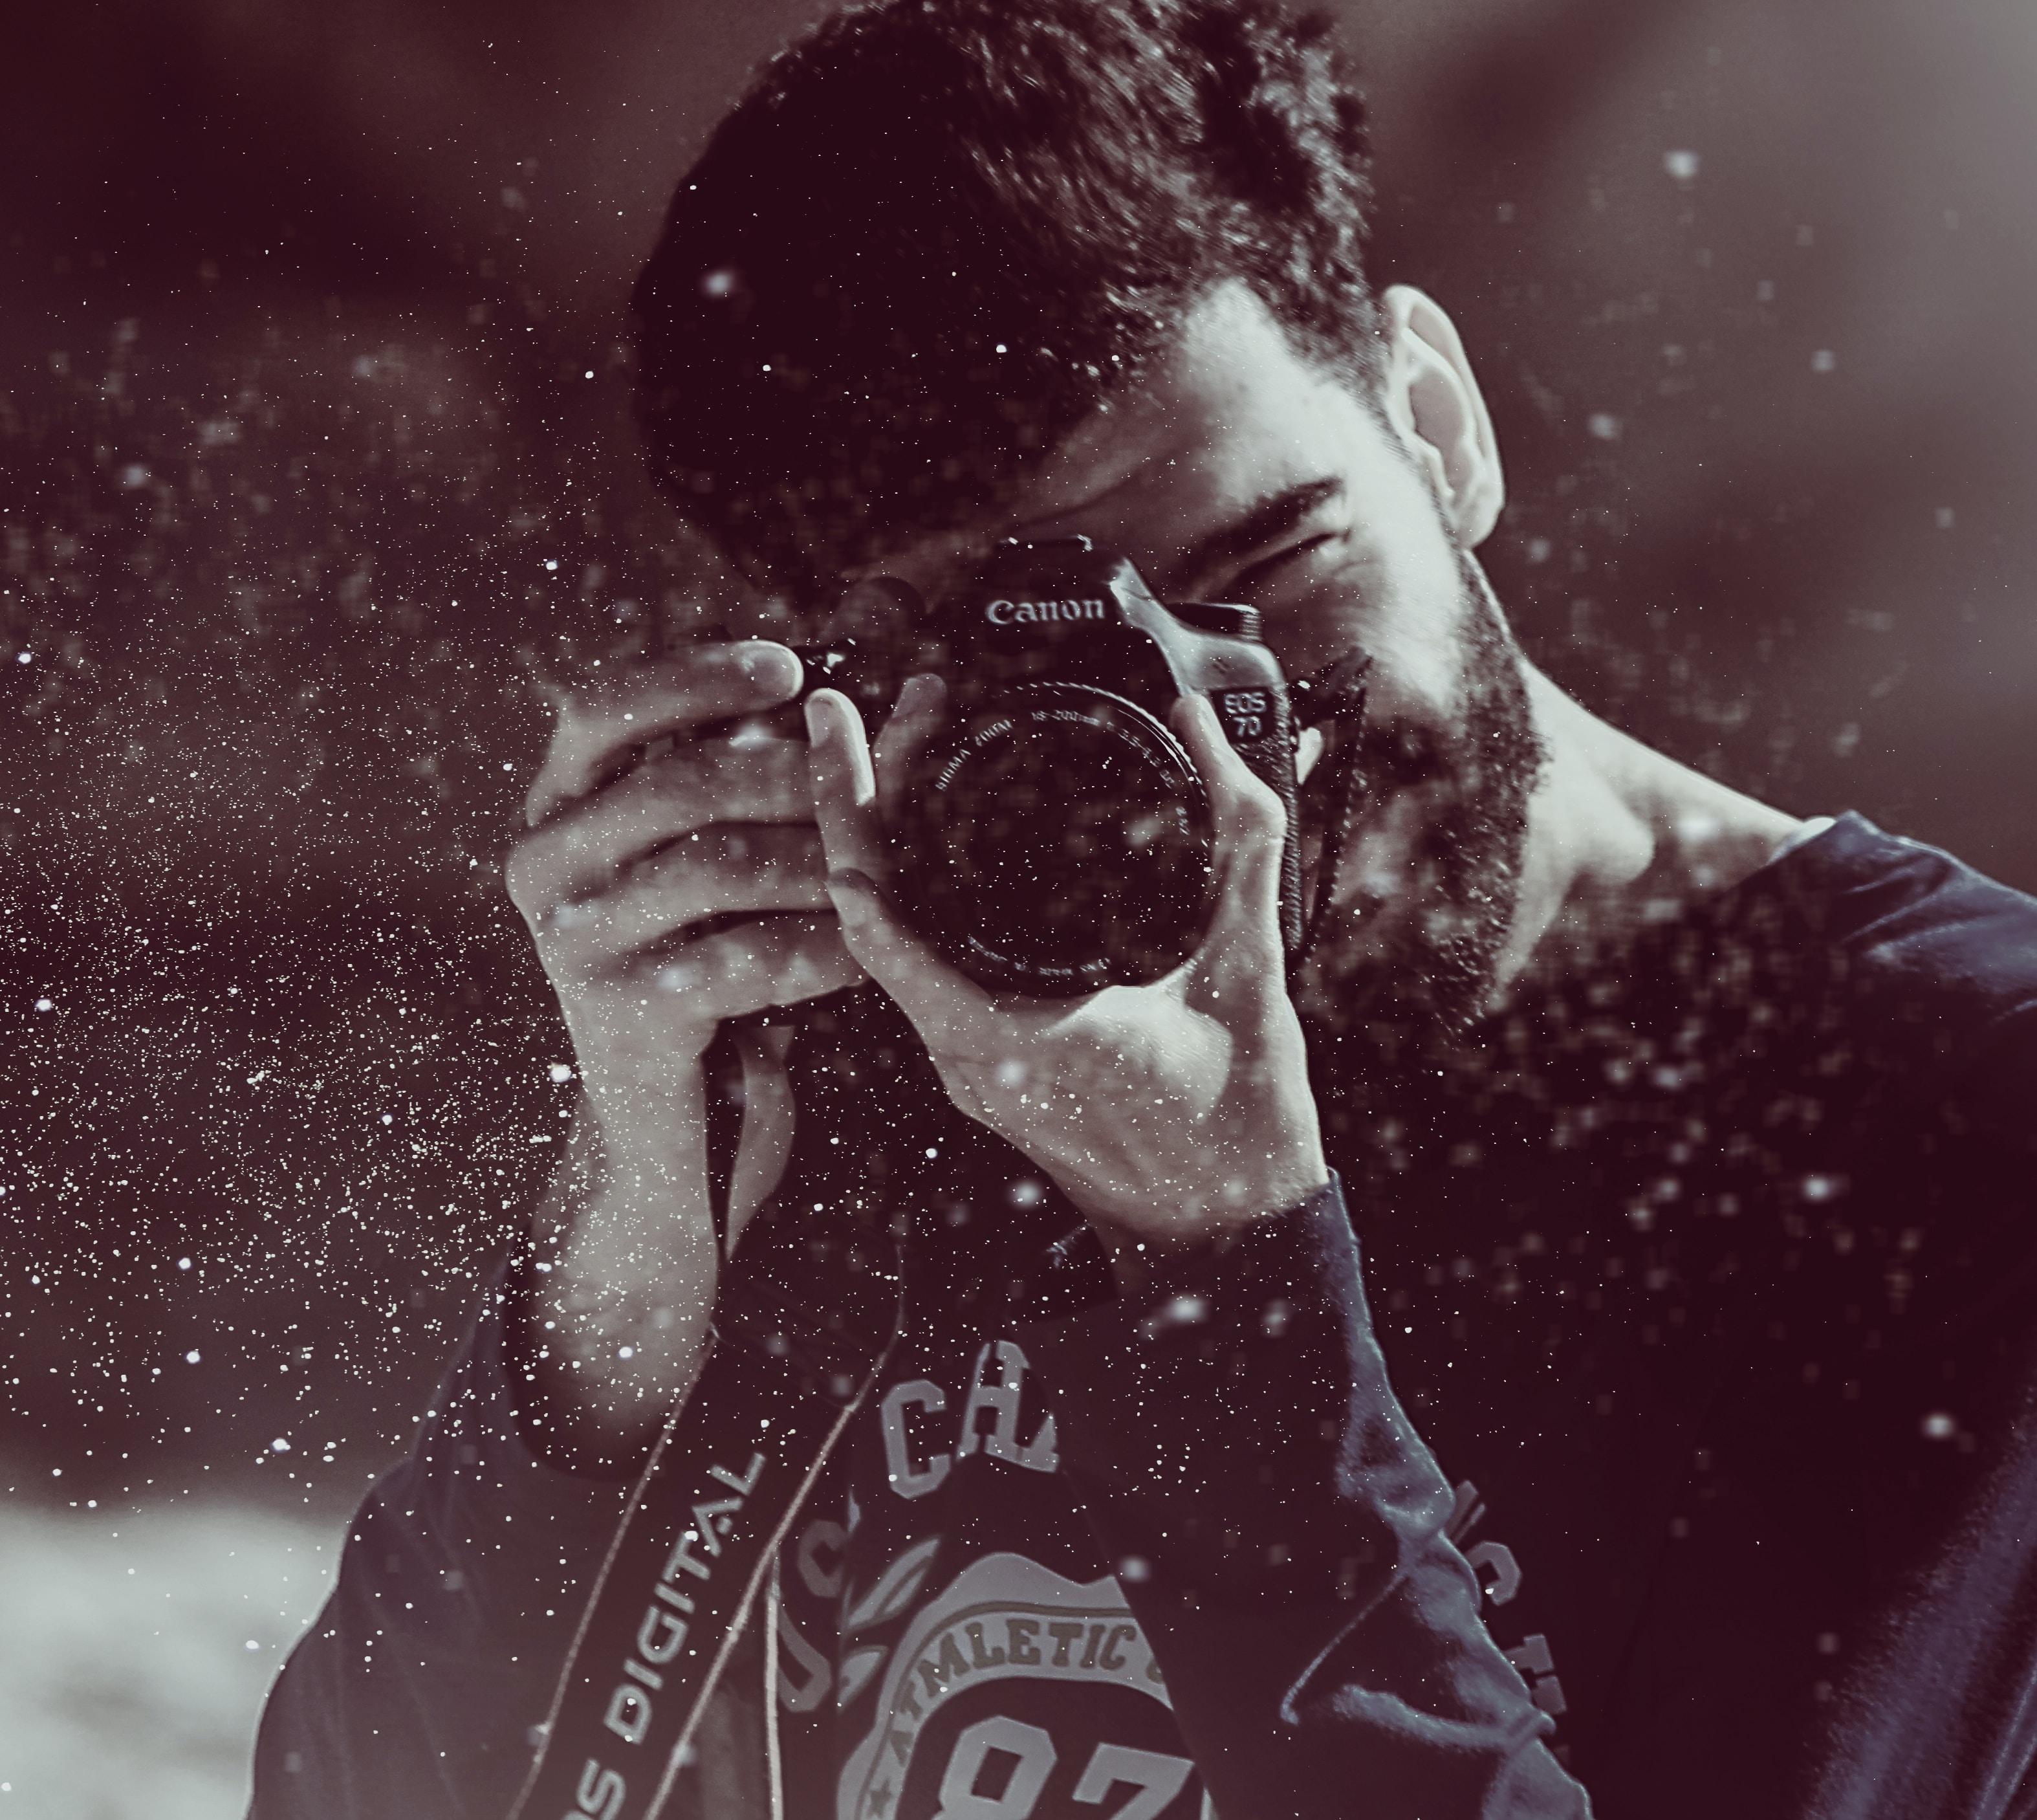 Young dark haired man with beard wearing sweatshirt taking a photo in Asilah